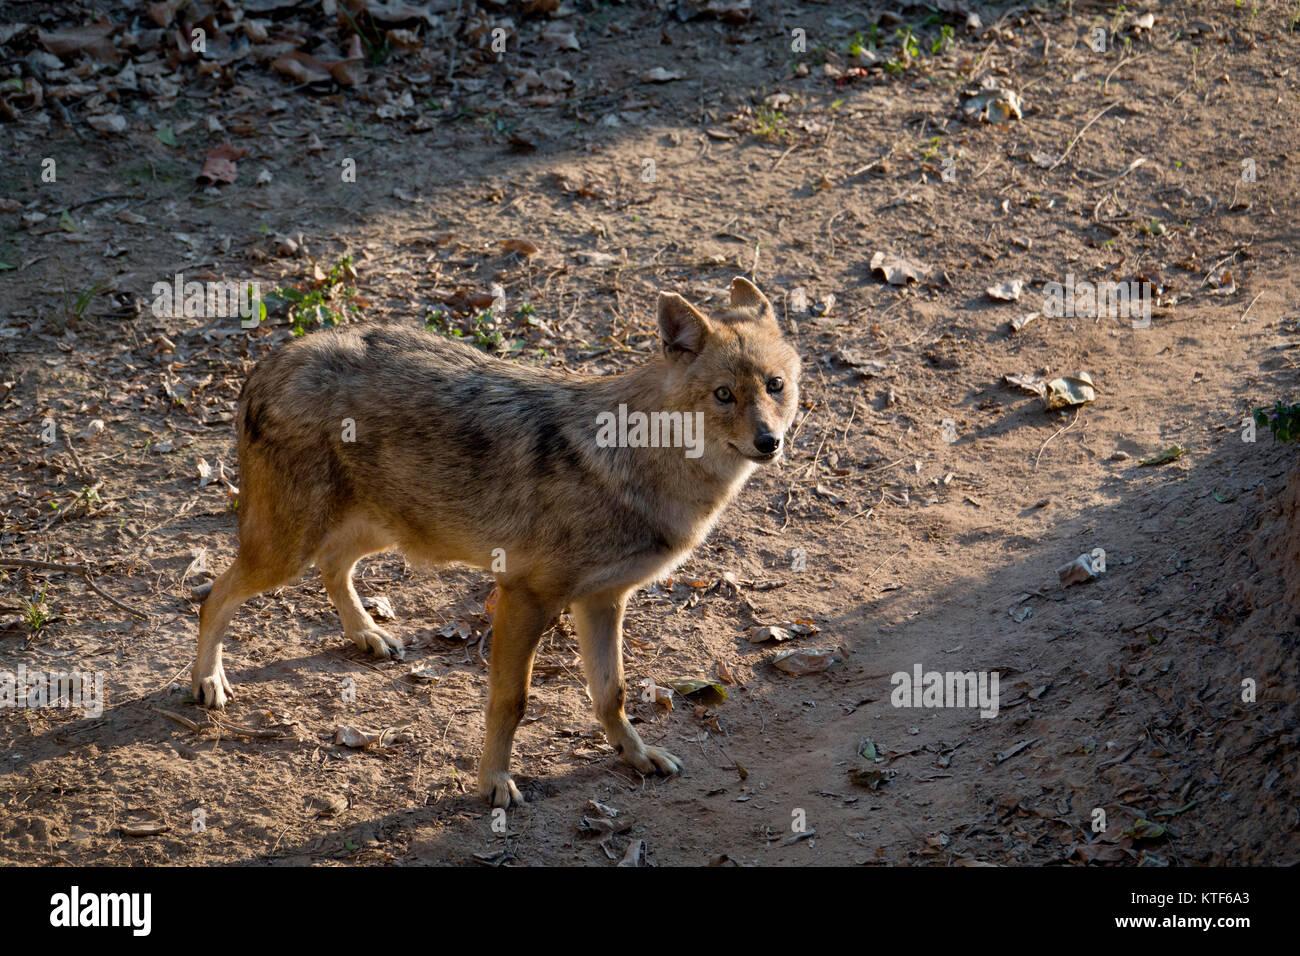 Indian wolf (Canis lupus pallipes) at Chhatbir Zoo, Punjab,India - Stock Image